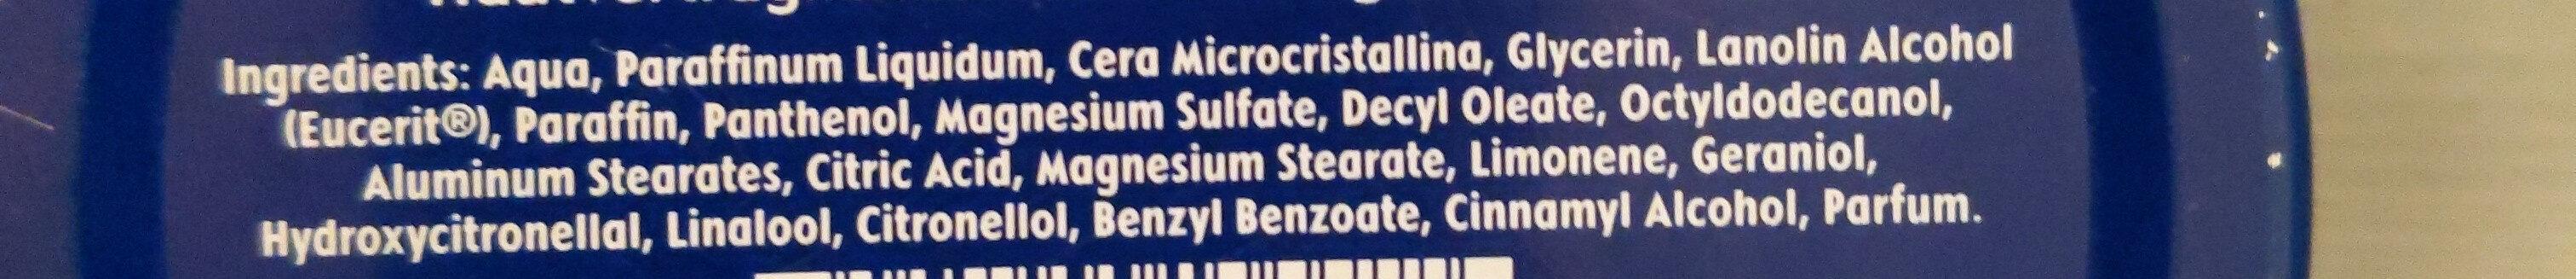 Nivea Creme - Ingredients - de